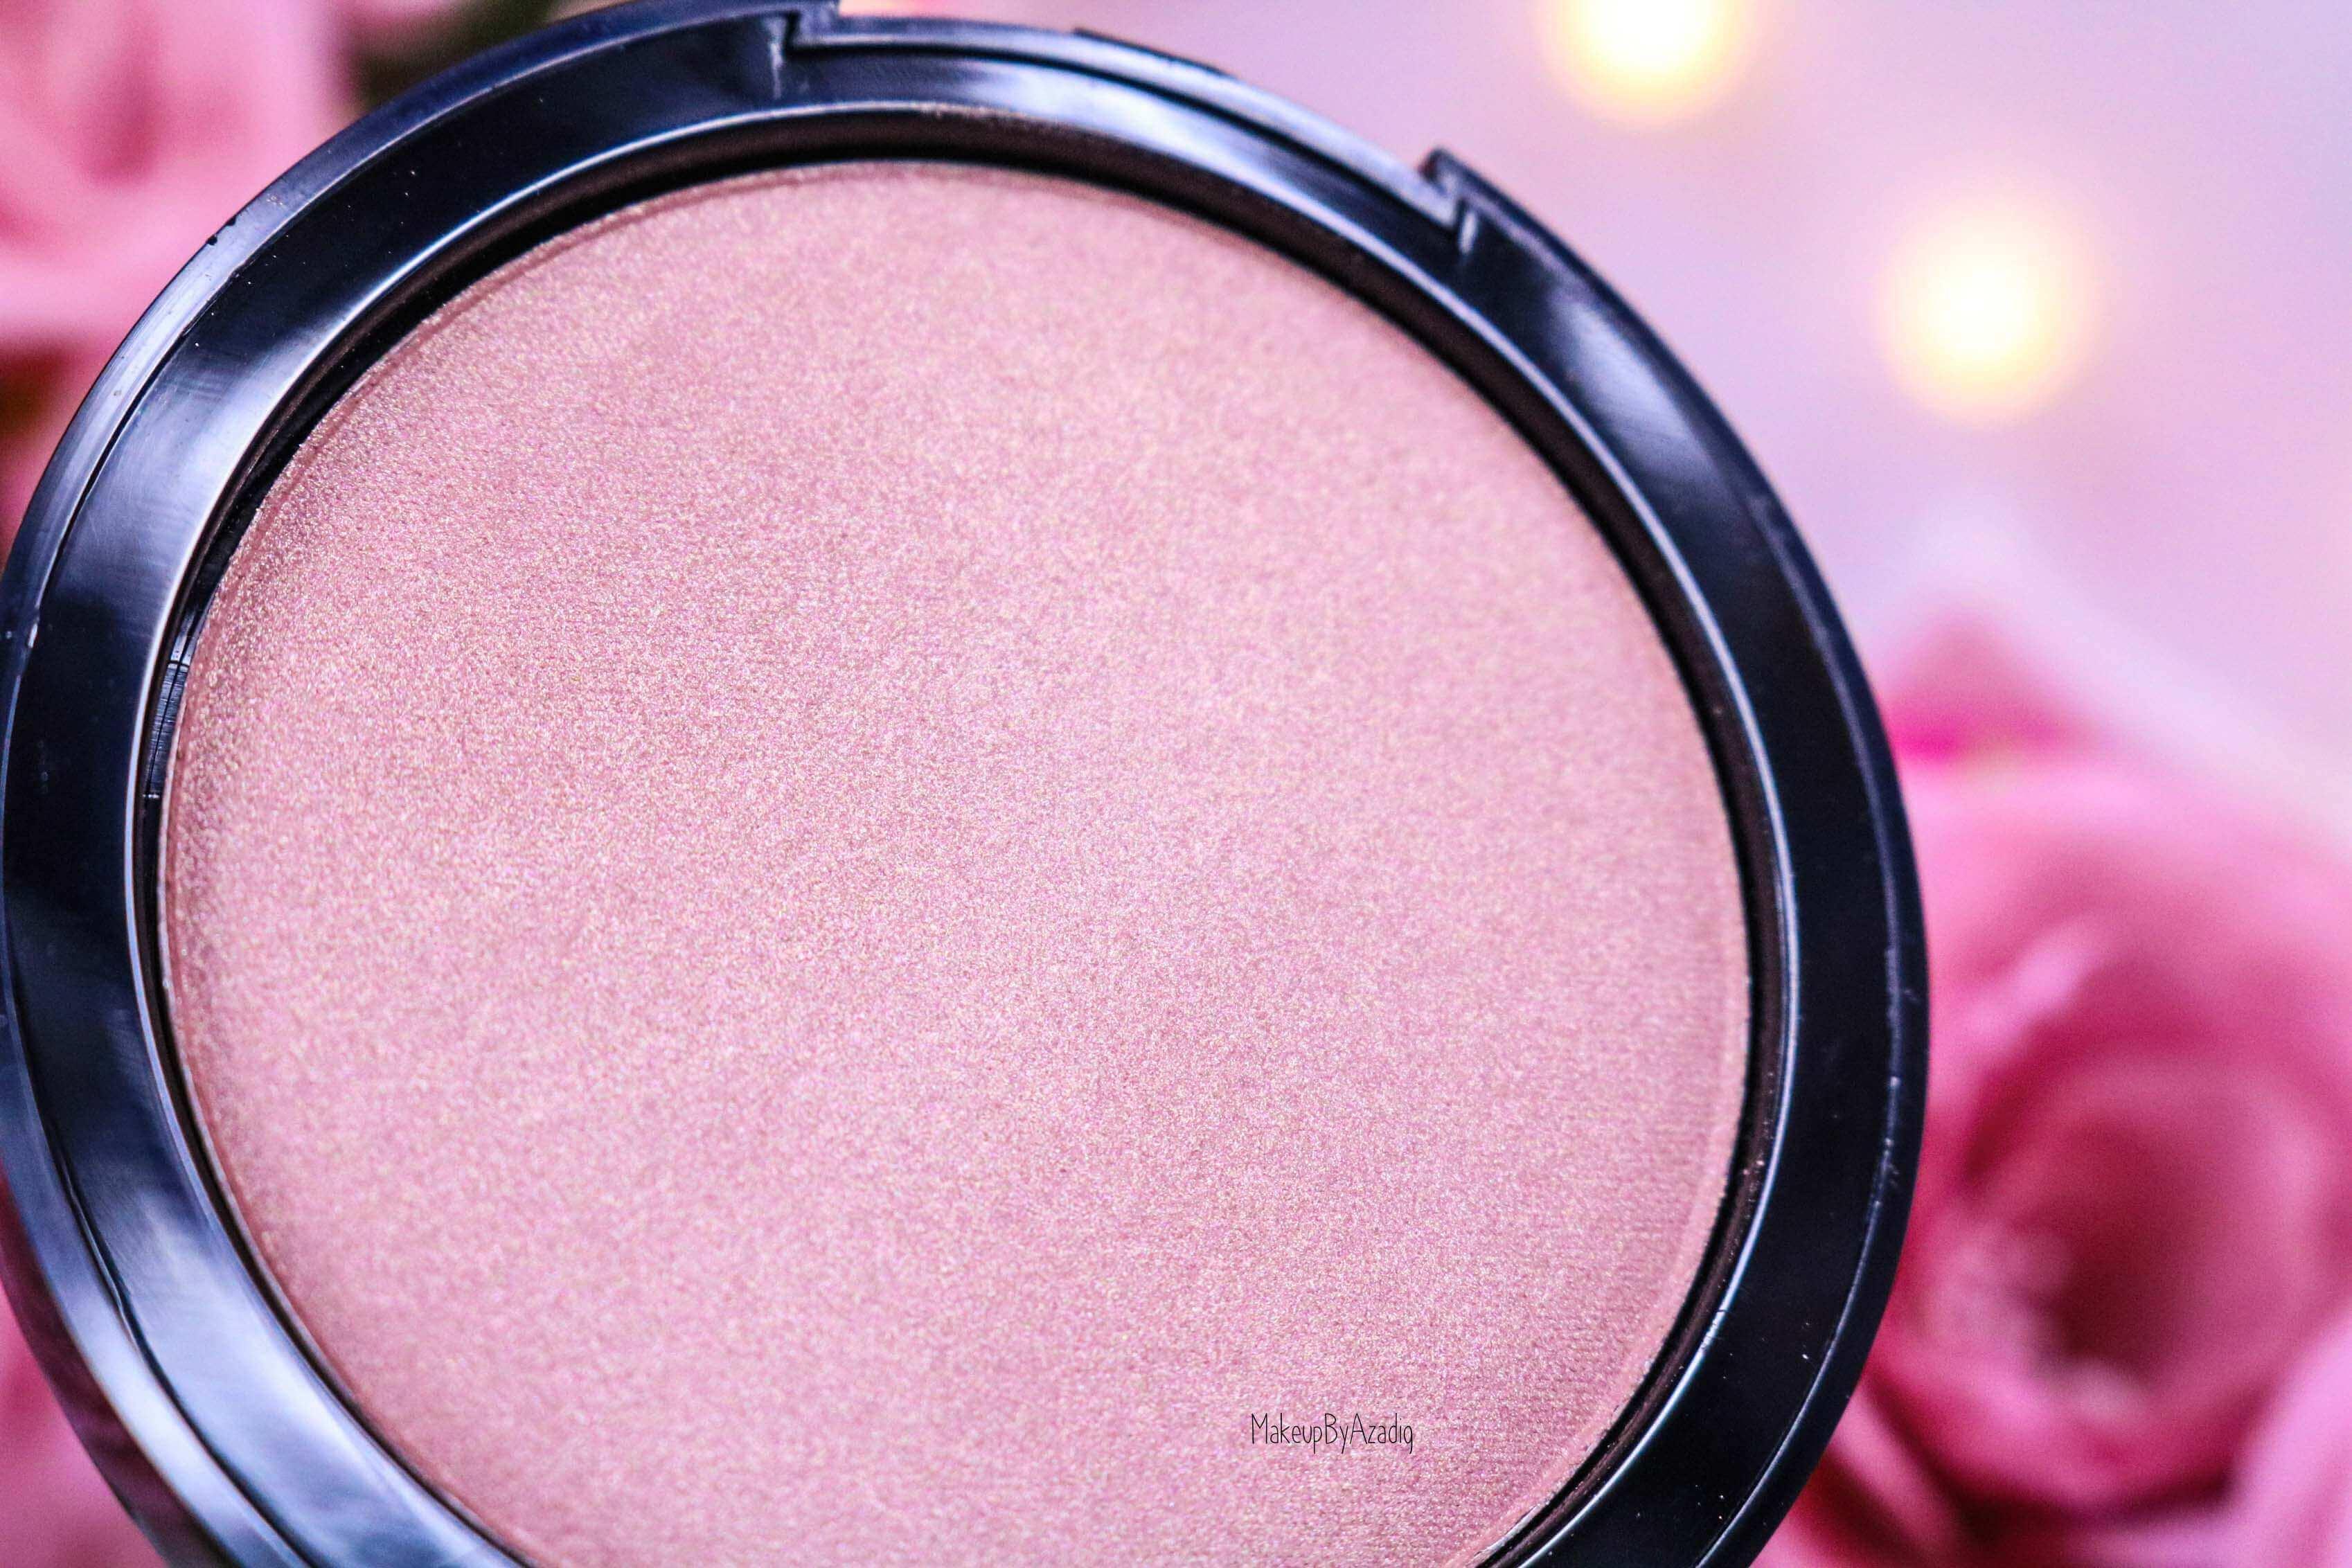 revue-highlighter-poudre-illuminatrice-golden-hour-dusk-sephora-collection-rosegold-avis-prix-swatch-makeupbyazadig-zoom